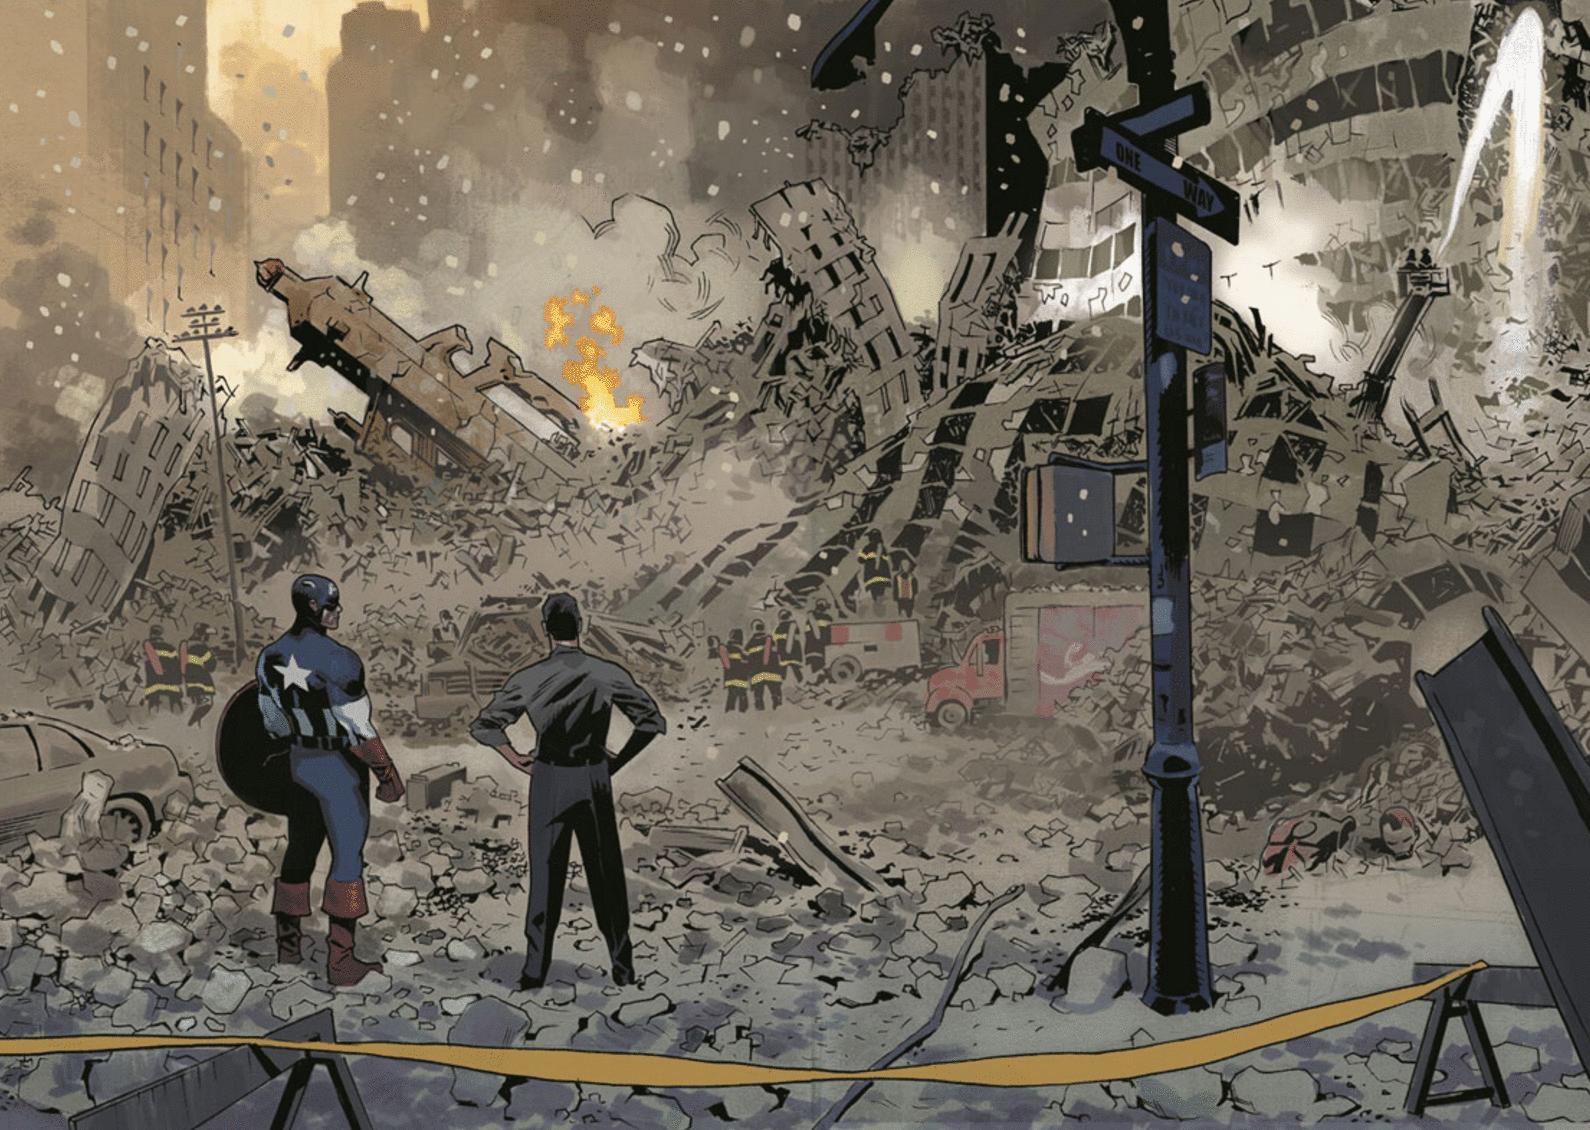 capitan américa 9/11 11 de septiembre